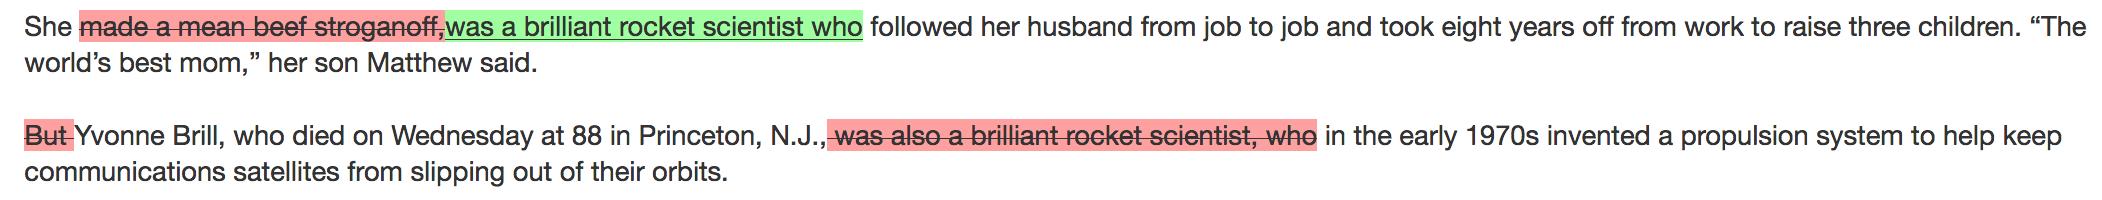 http://www.newsdiffs.org/diff/192021/192137/www.nytimes.com/2013/03/31/science/space/yvonne-brill-rocket-scientist-dies-at-88.html